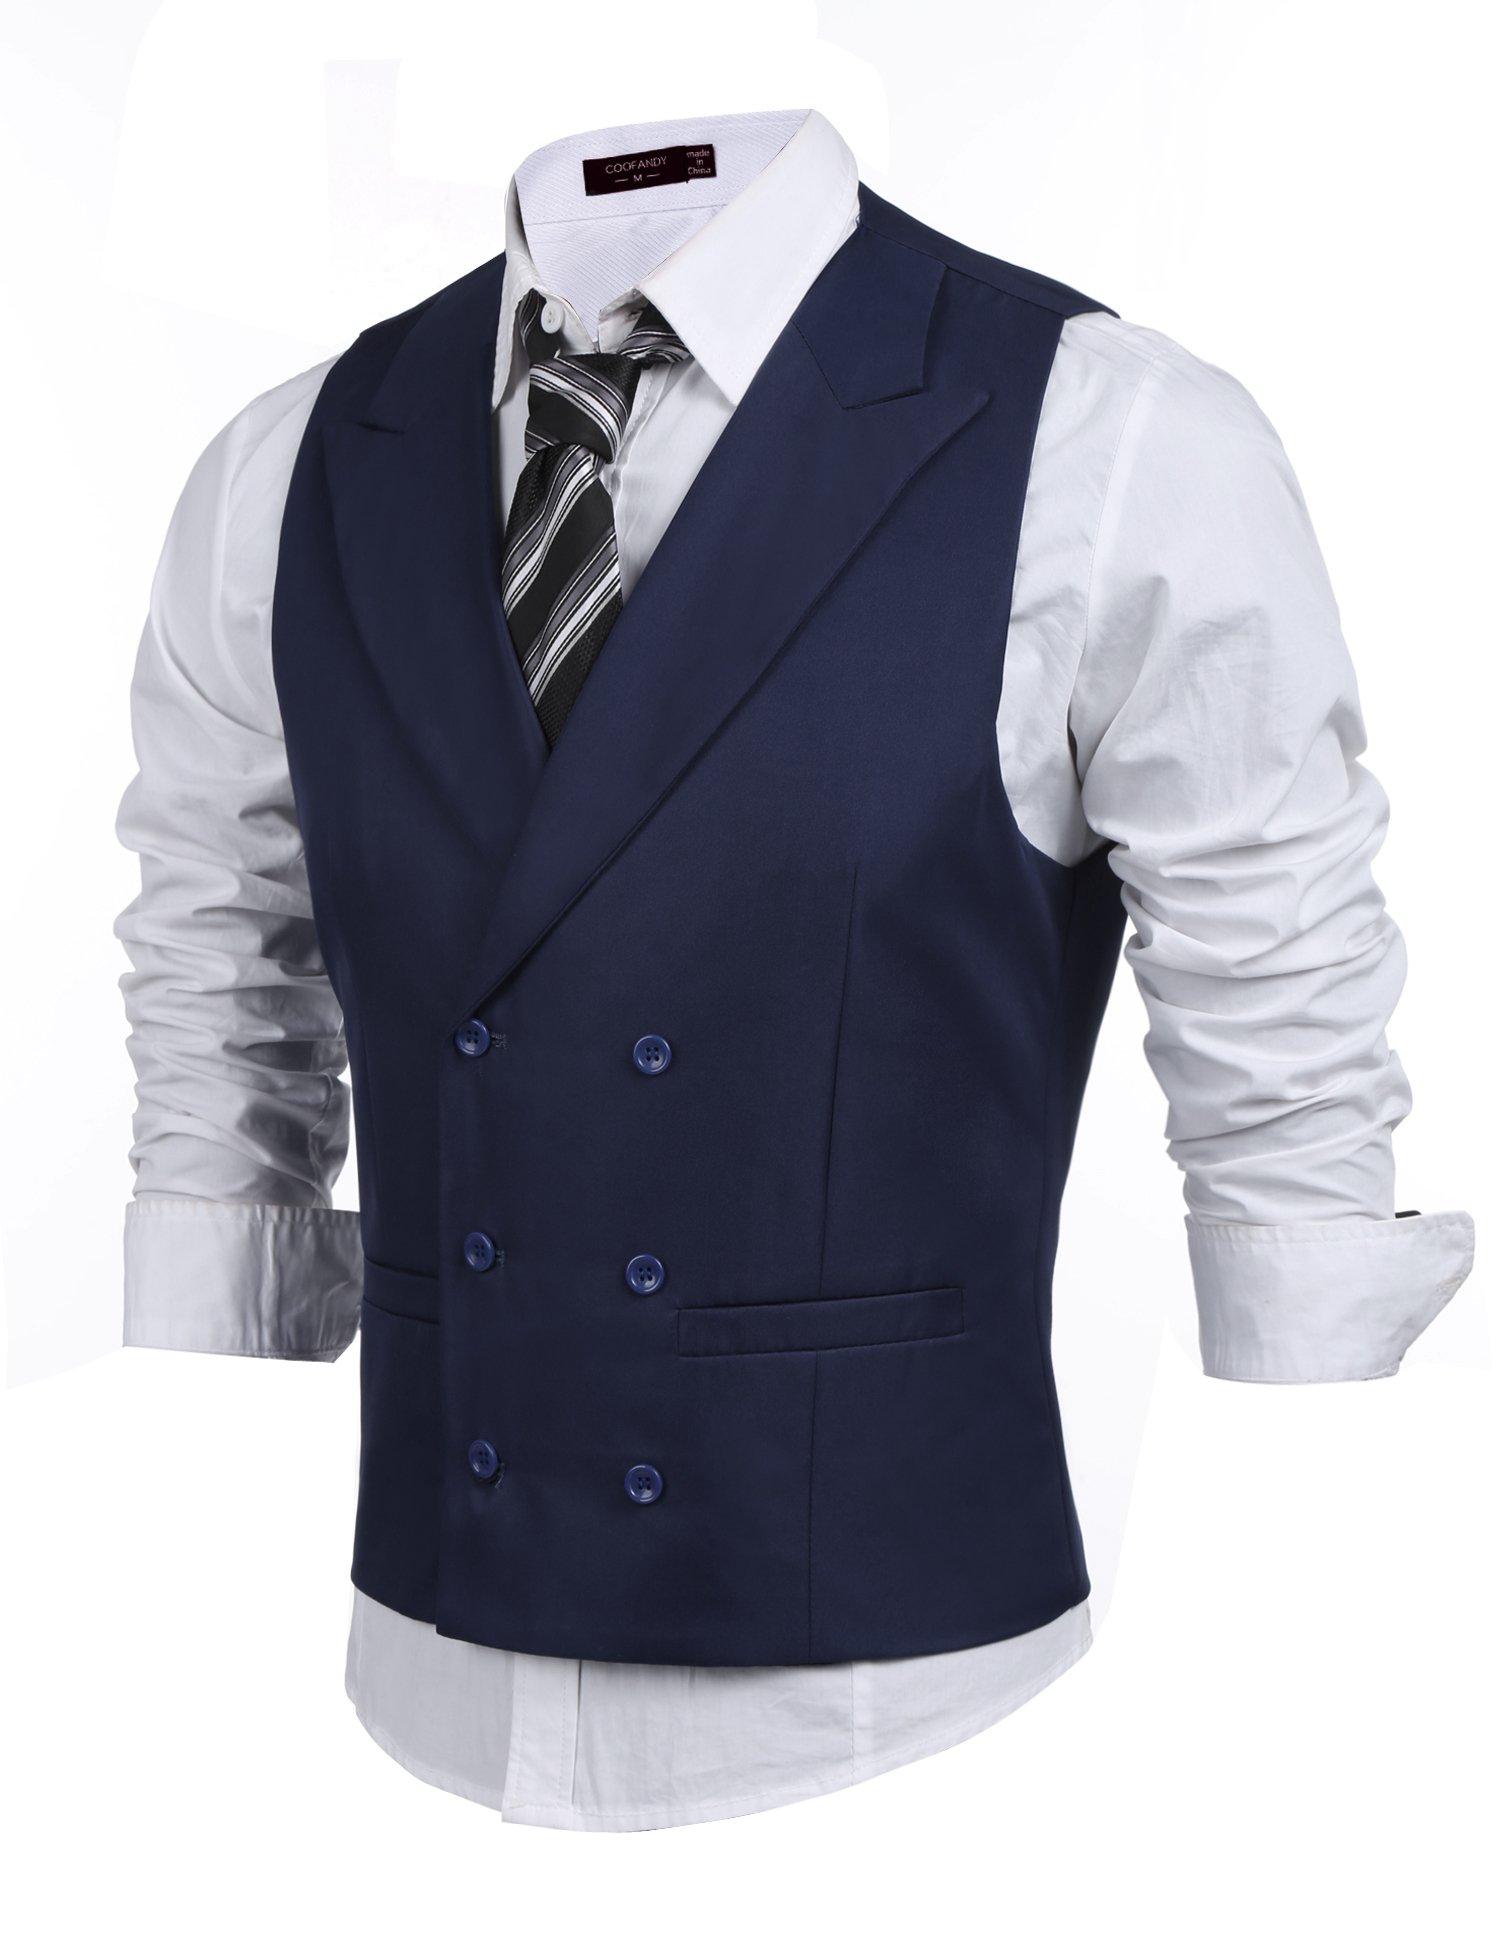 Coofandy Men's Double Breasted Suit Vest,Slim Fit Business Formal Dress Waistcoat (X-Large (US Large), Deep Blue)